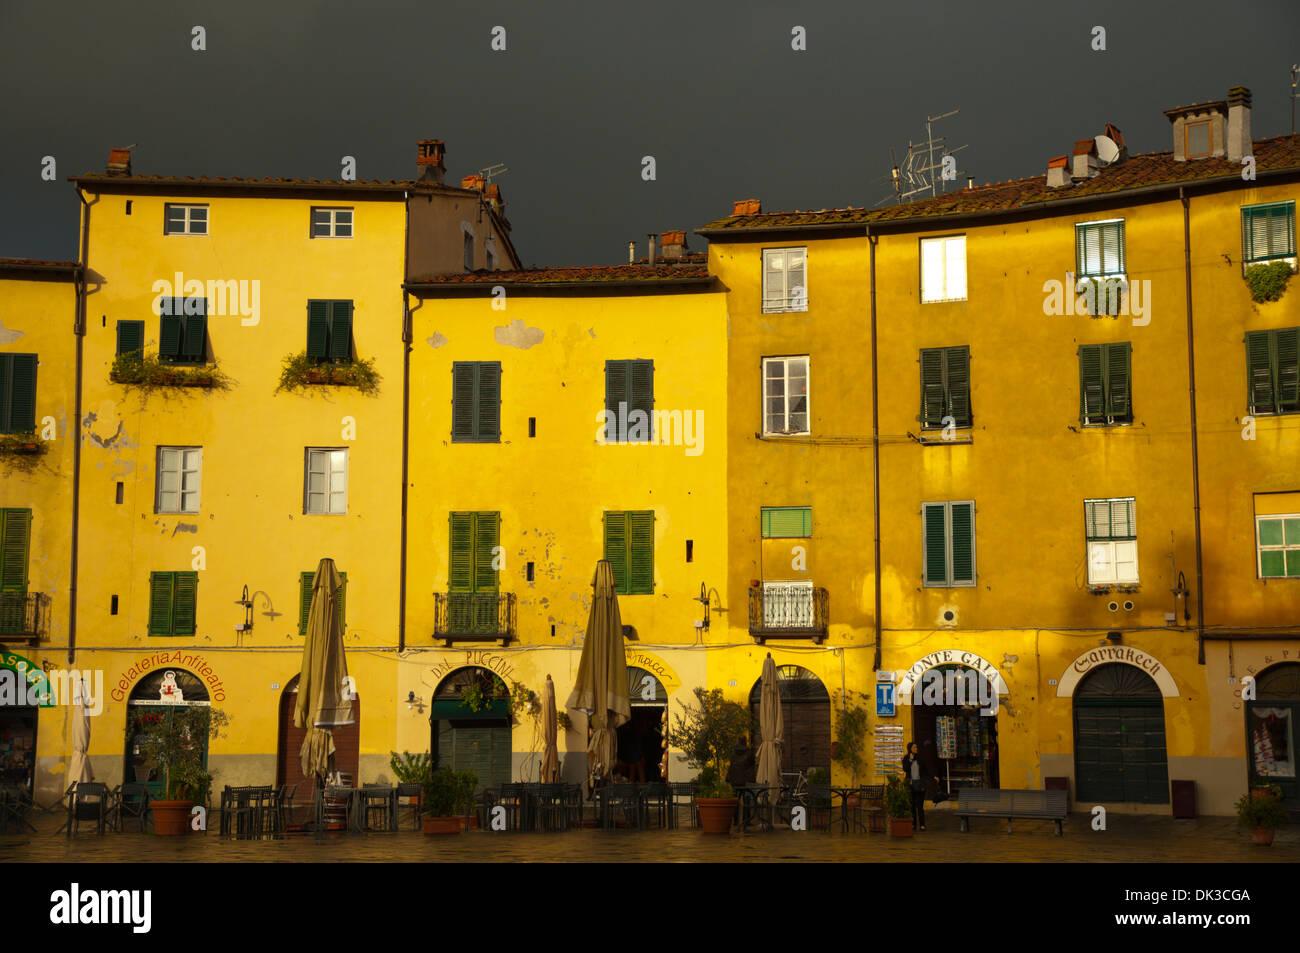 Piazza Amfiteatro square Lucca city Tuscany region Italy Europe - Stock Image